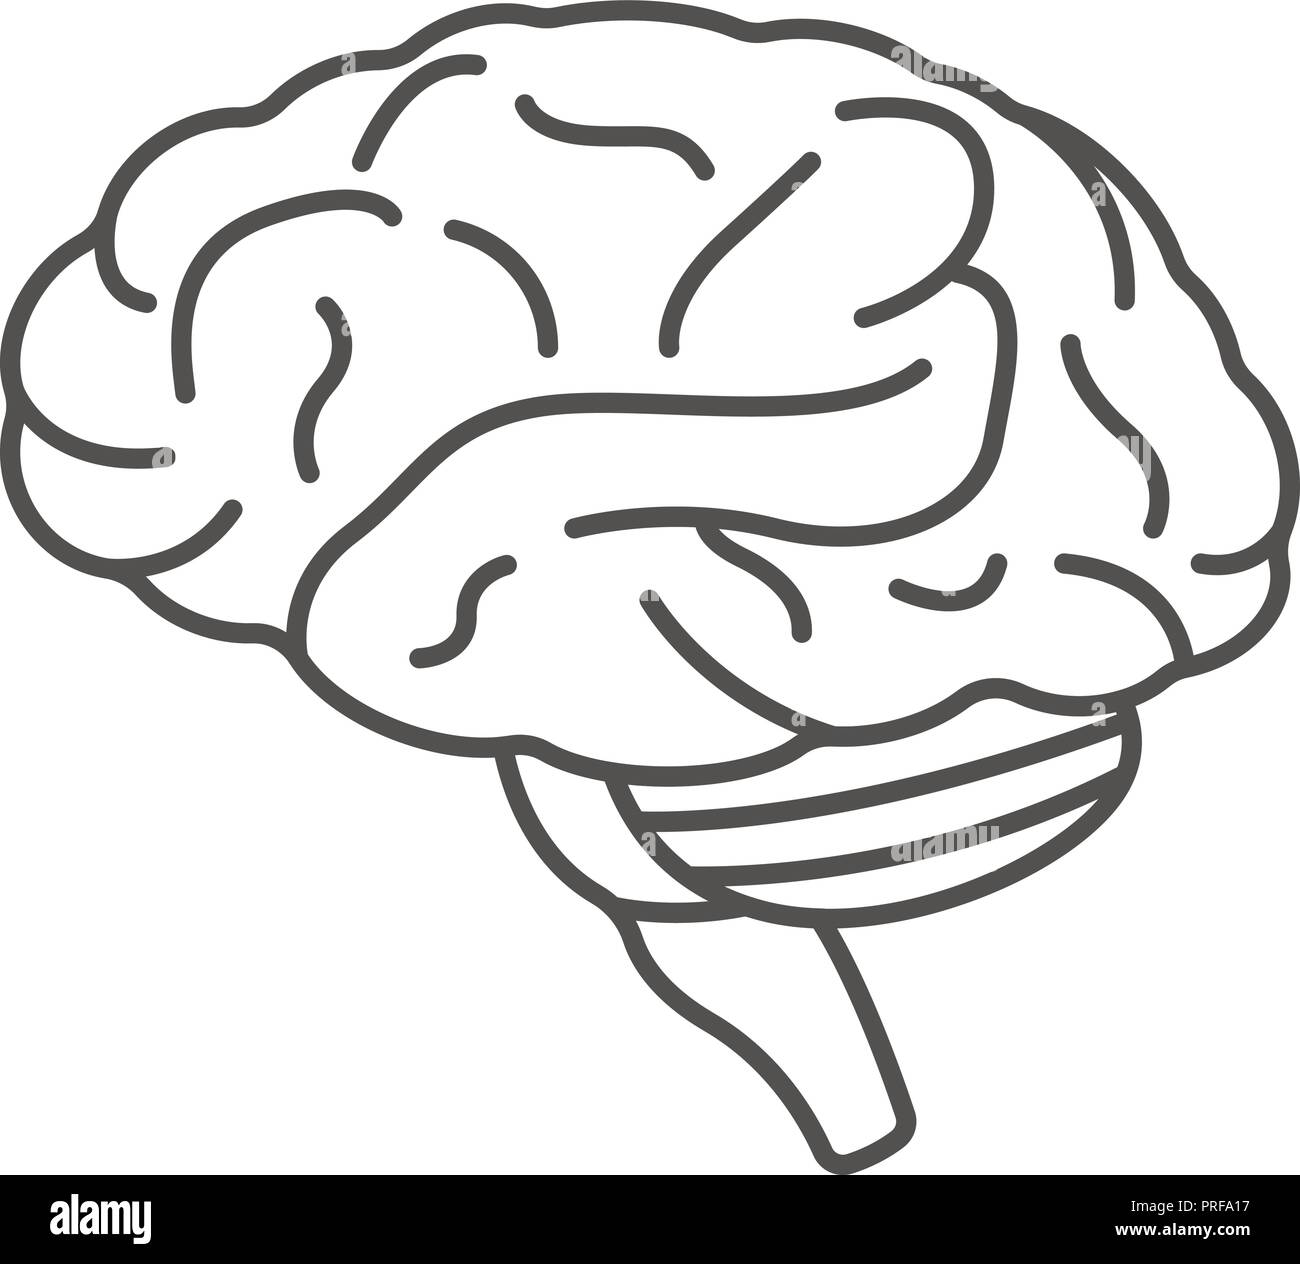 human brain icon outline style stock vector image art alamy https www alamy com human brain icon outline style image220998659 html